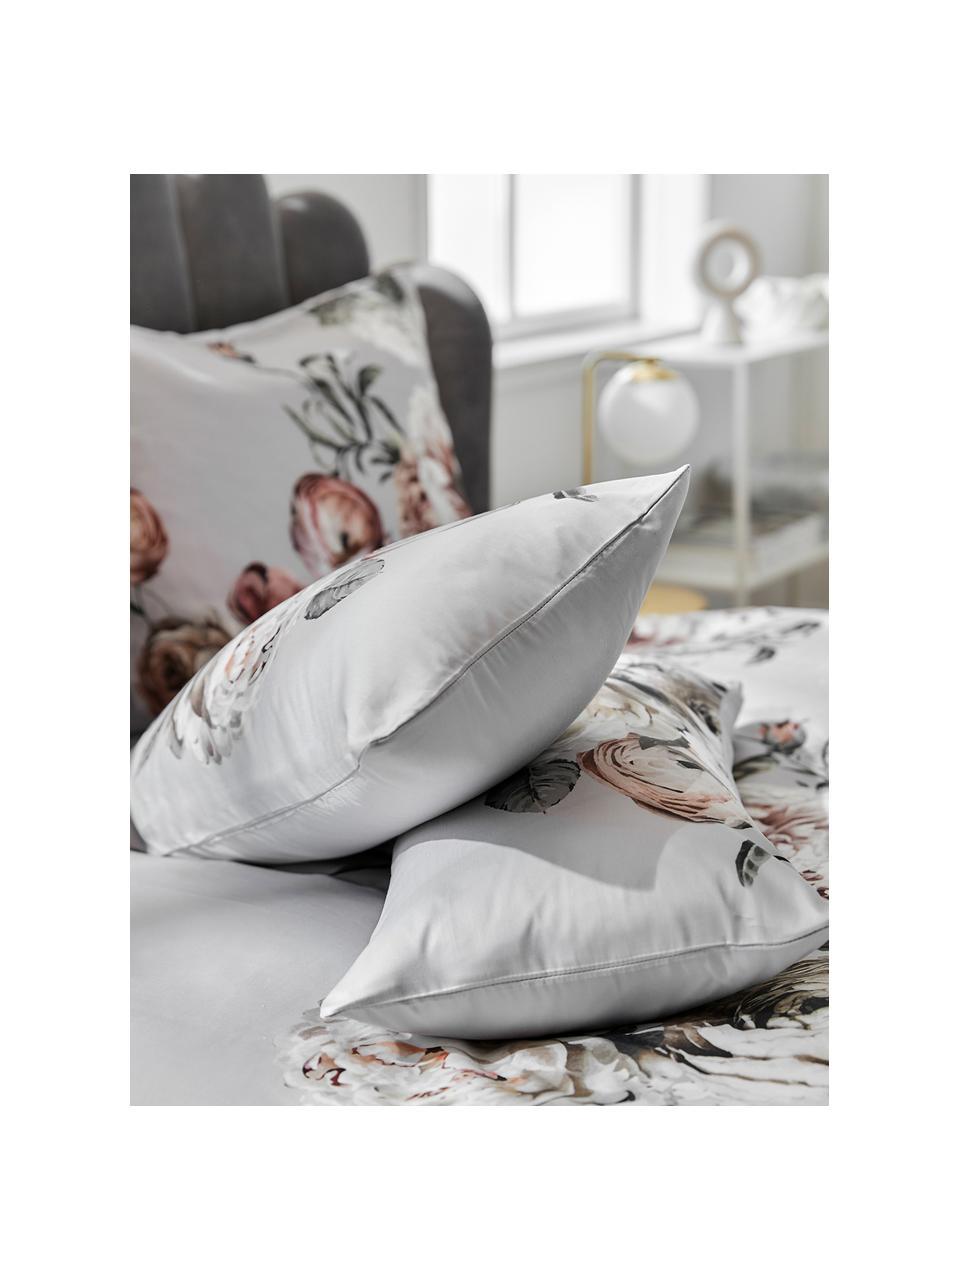 Baumwollsatin-Kissenbezüge Blossom mit Blumen-Print, 2 Stück, Webart: Satin Fadendichte 210 TC,, Mehrfarbig, Grau, 40 x 80 cm